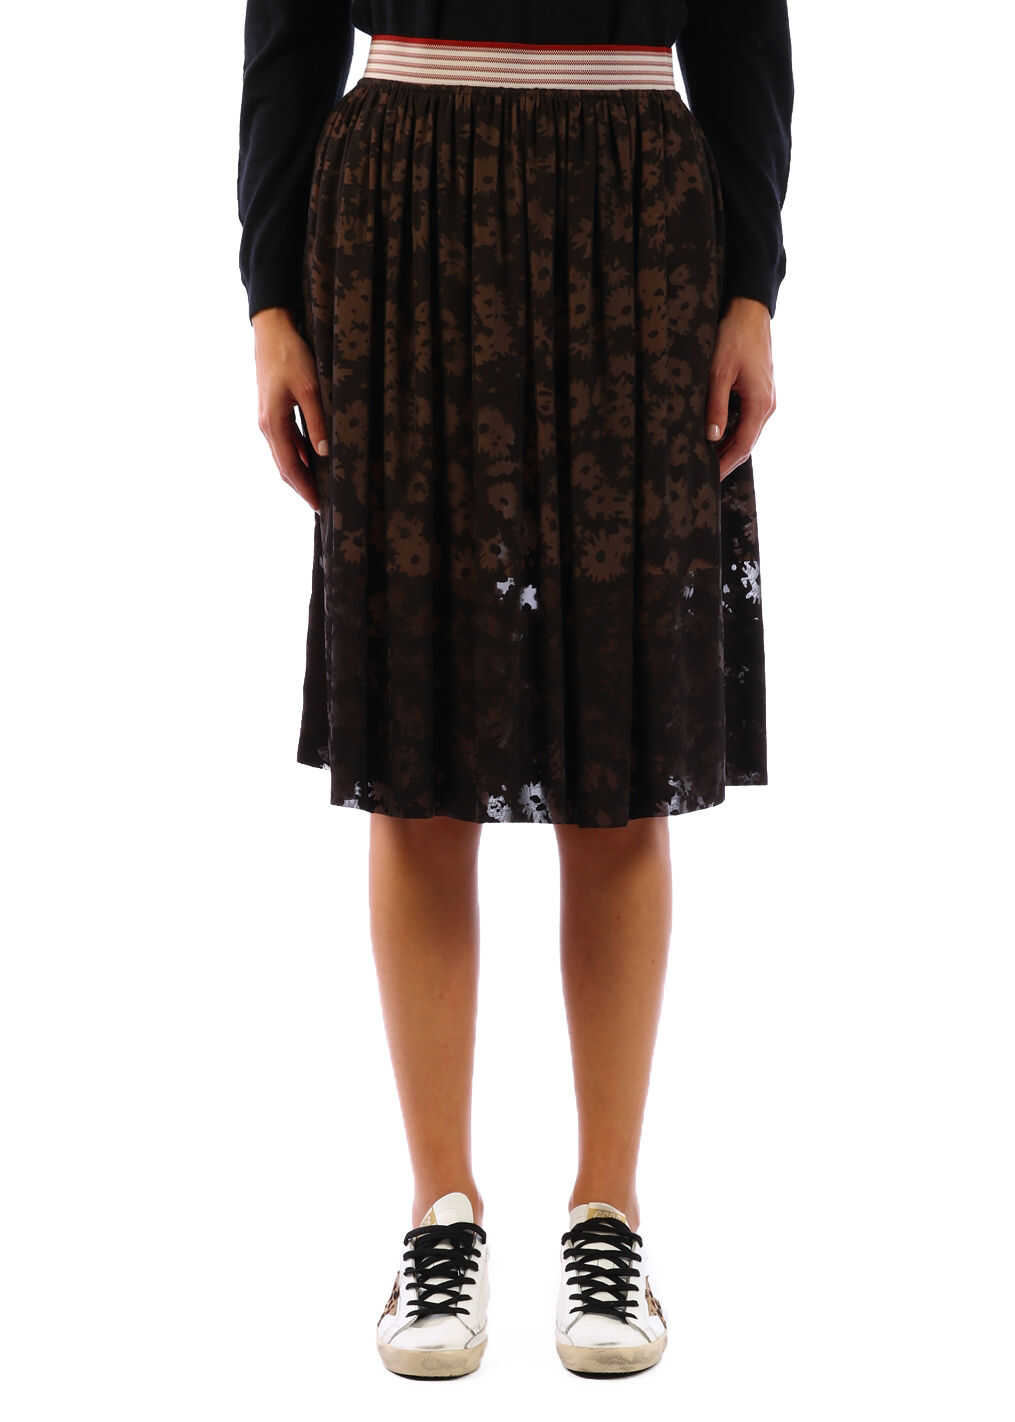 adidas by Stella McCartney Flowered Skirt Black